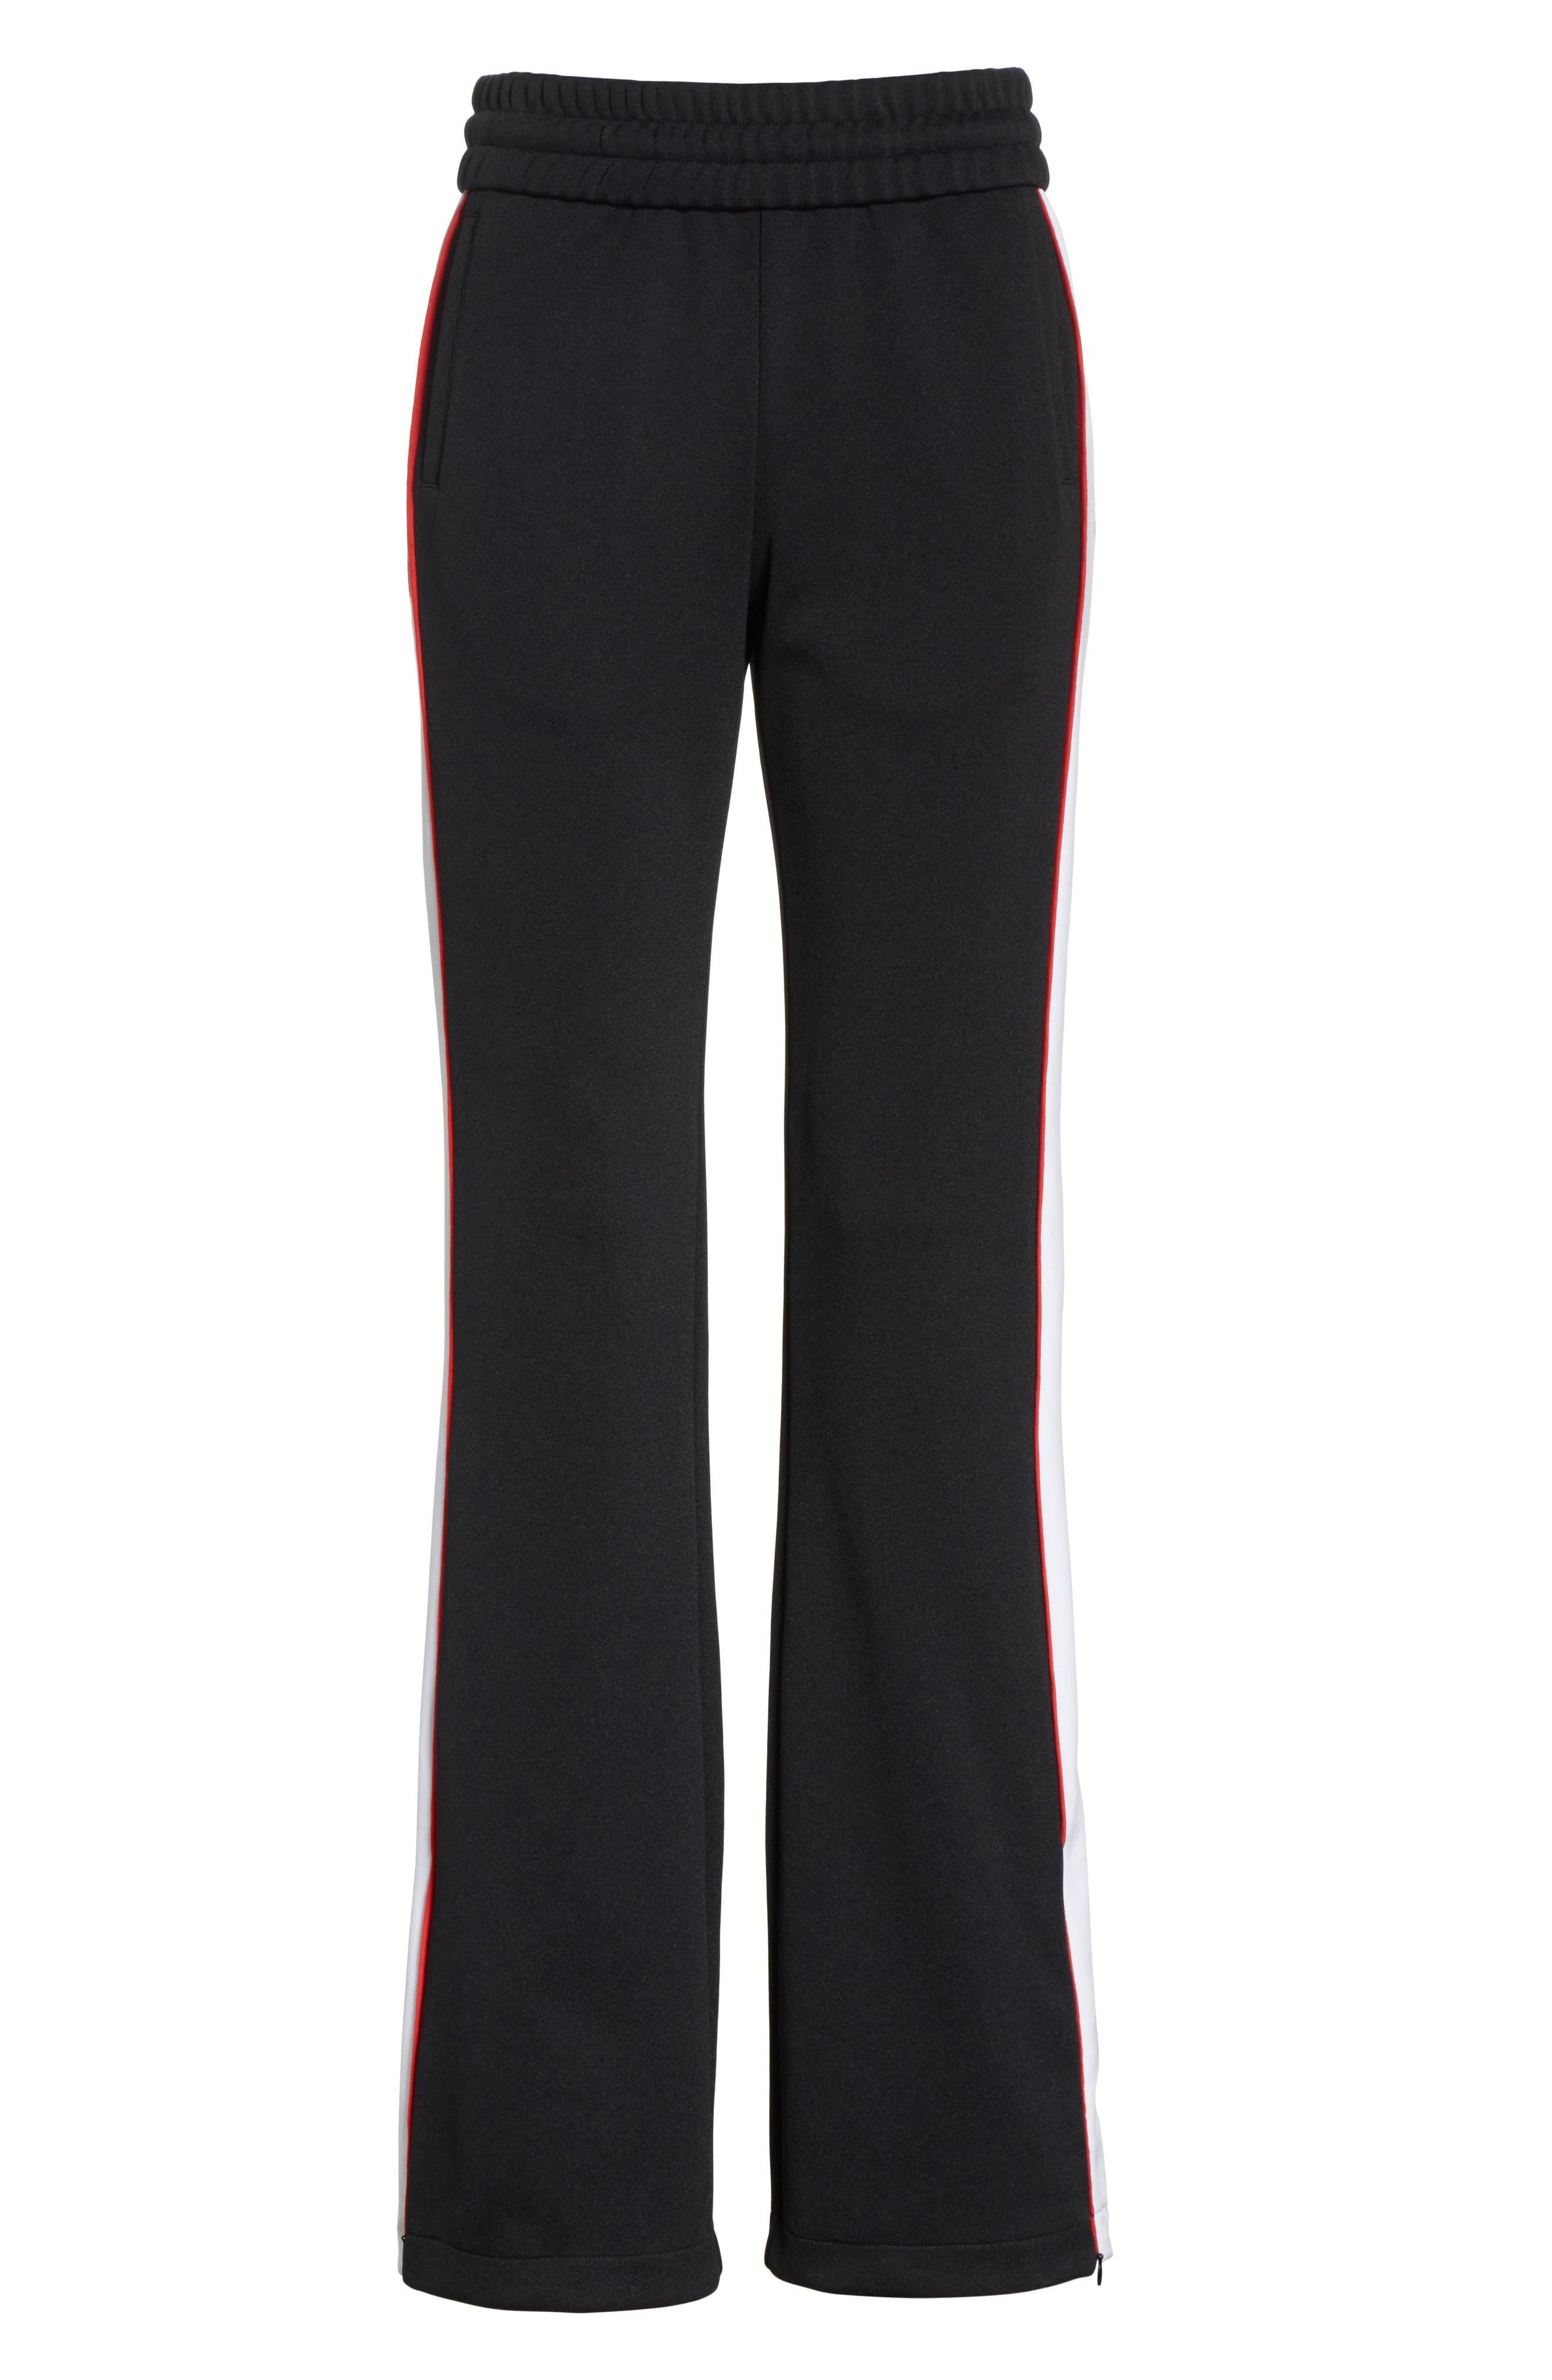 Flare Leg Track Pants,                             Alternate thumbnail 6, color,                             Black/ No Color